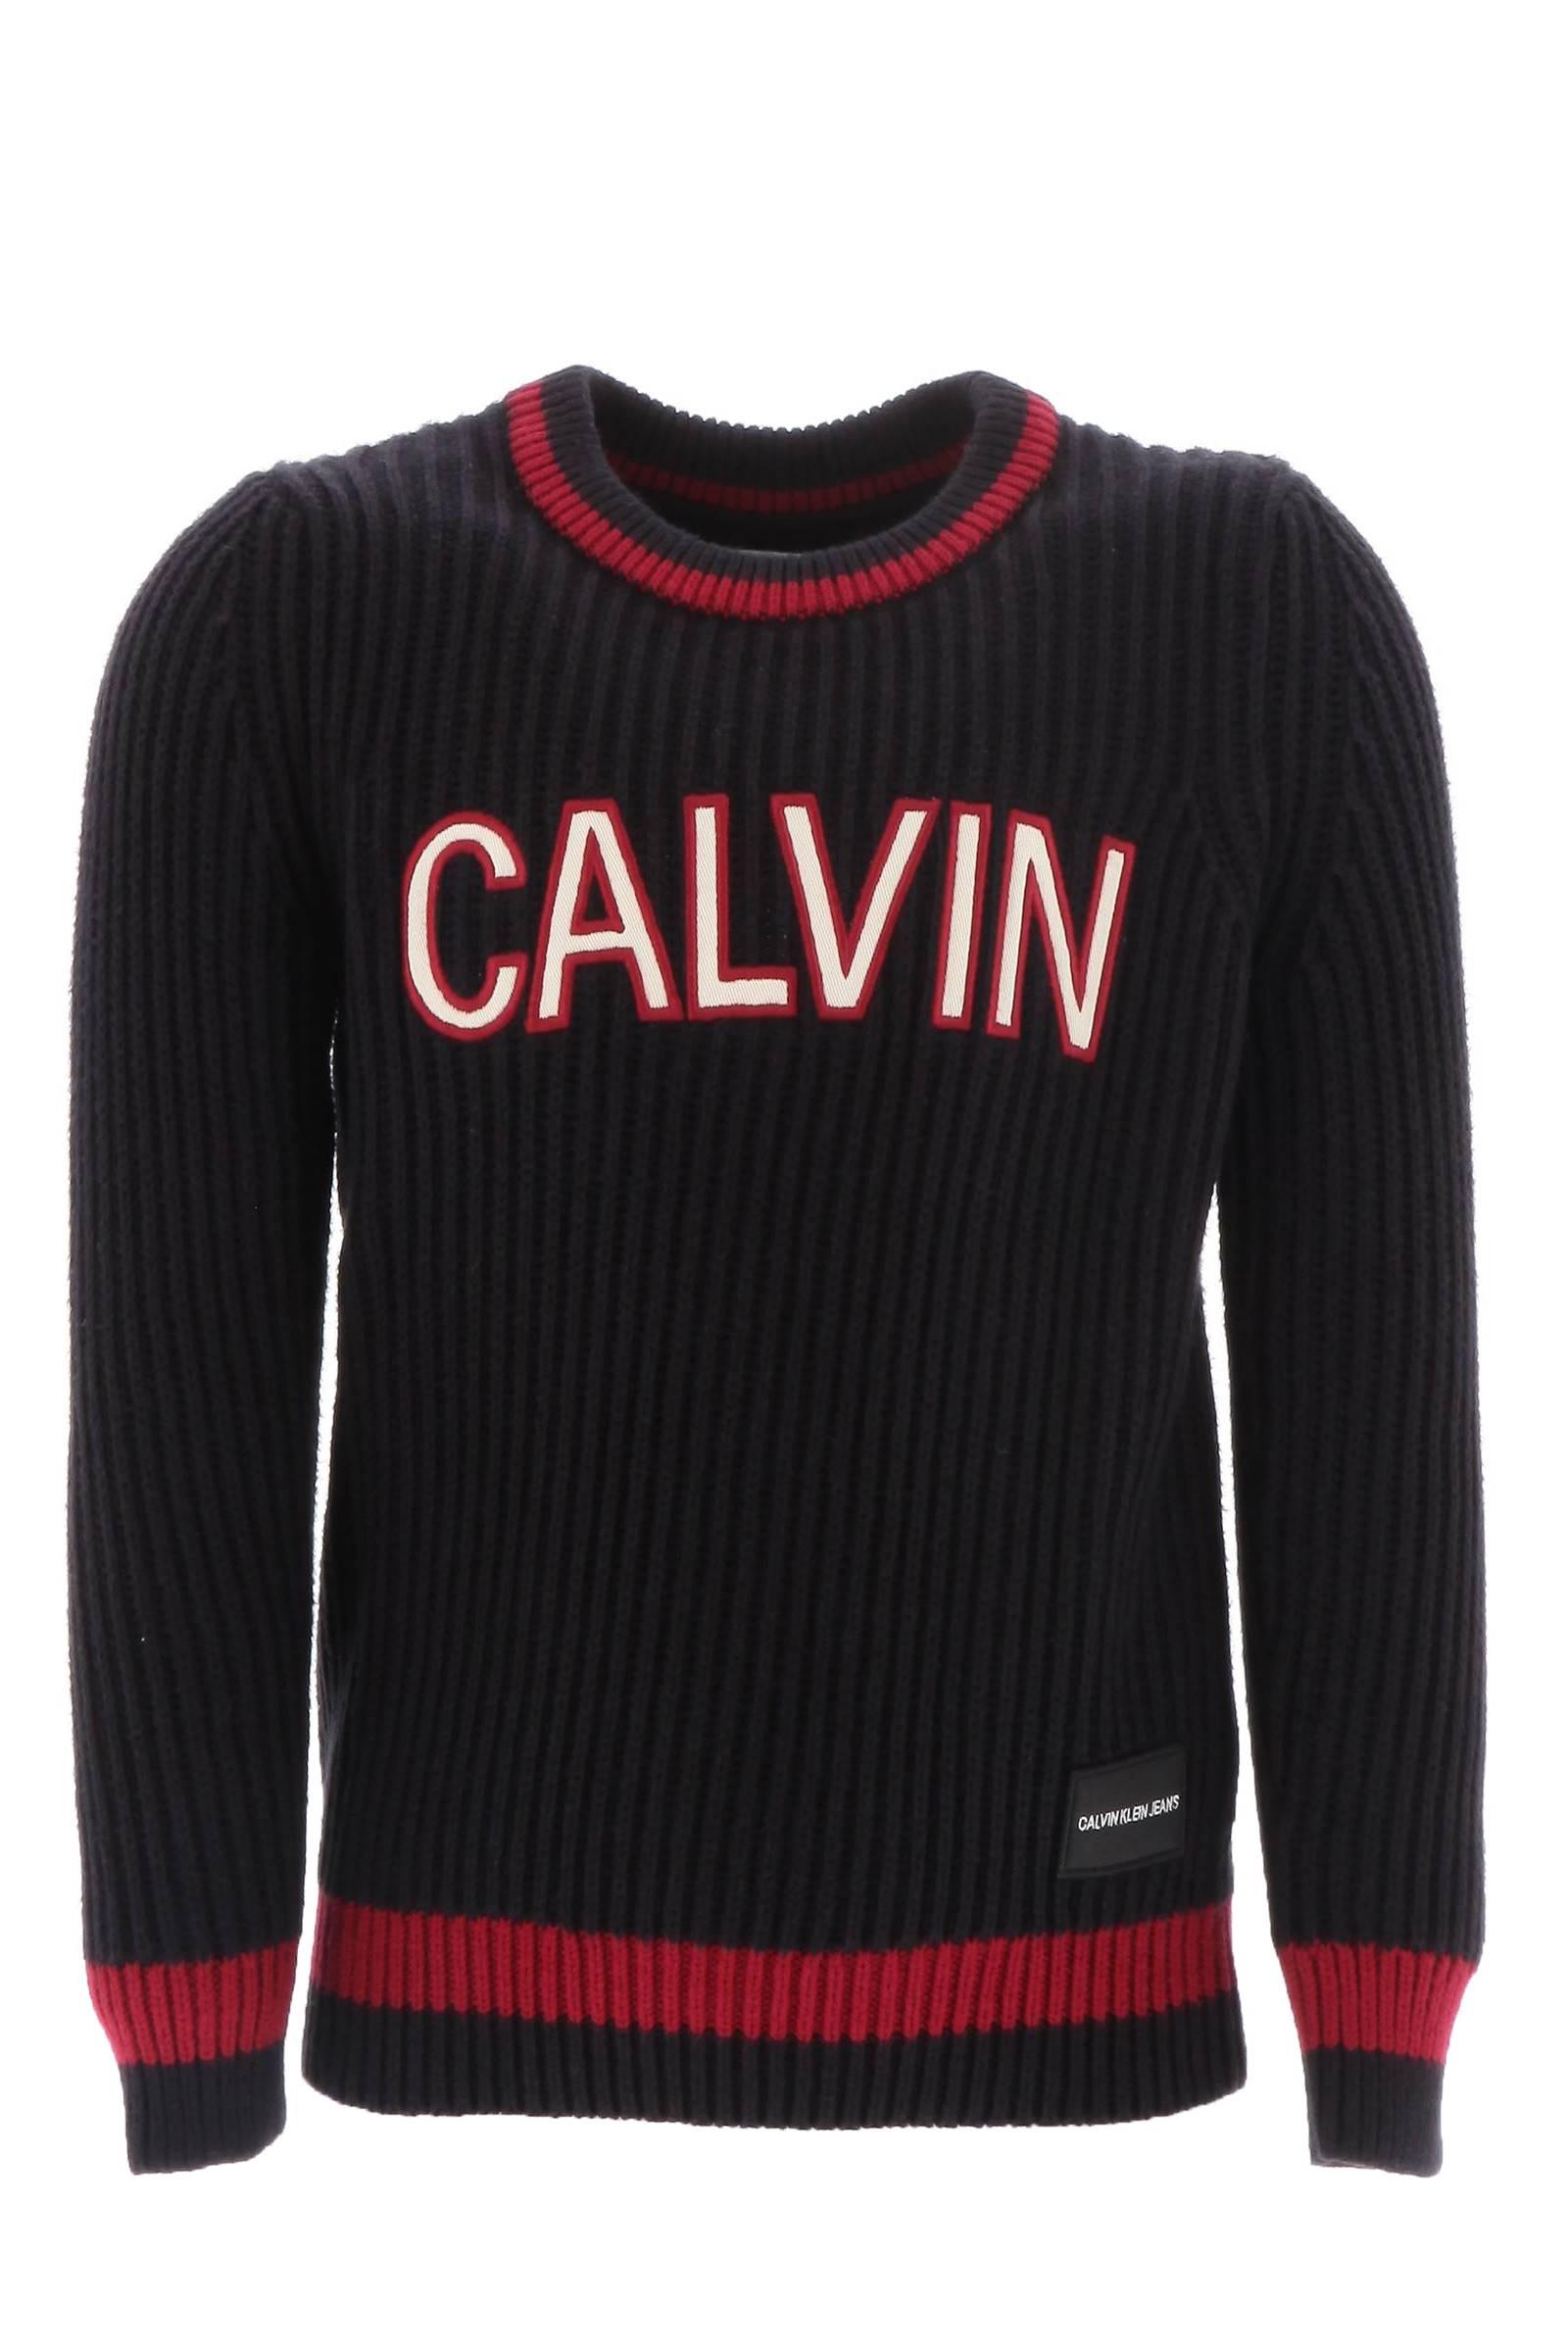 calvin pullover CALVIN KLEIN   Pullover   IB0IB00308005